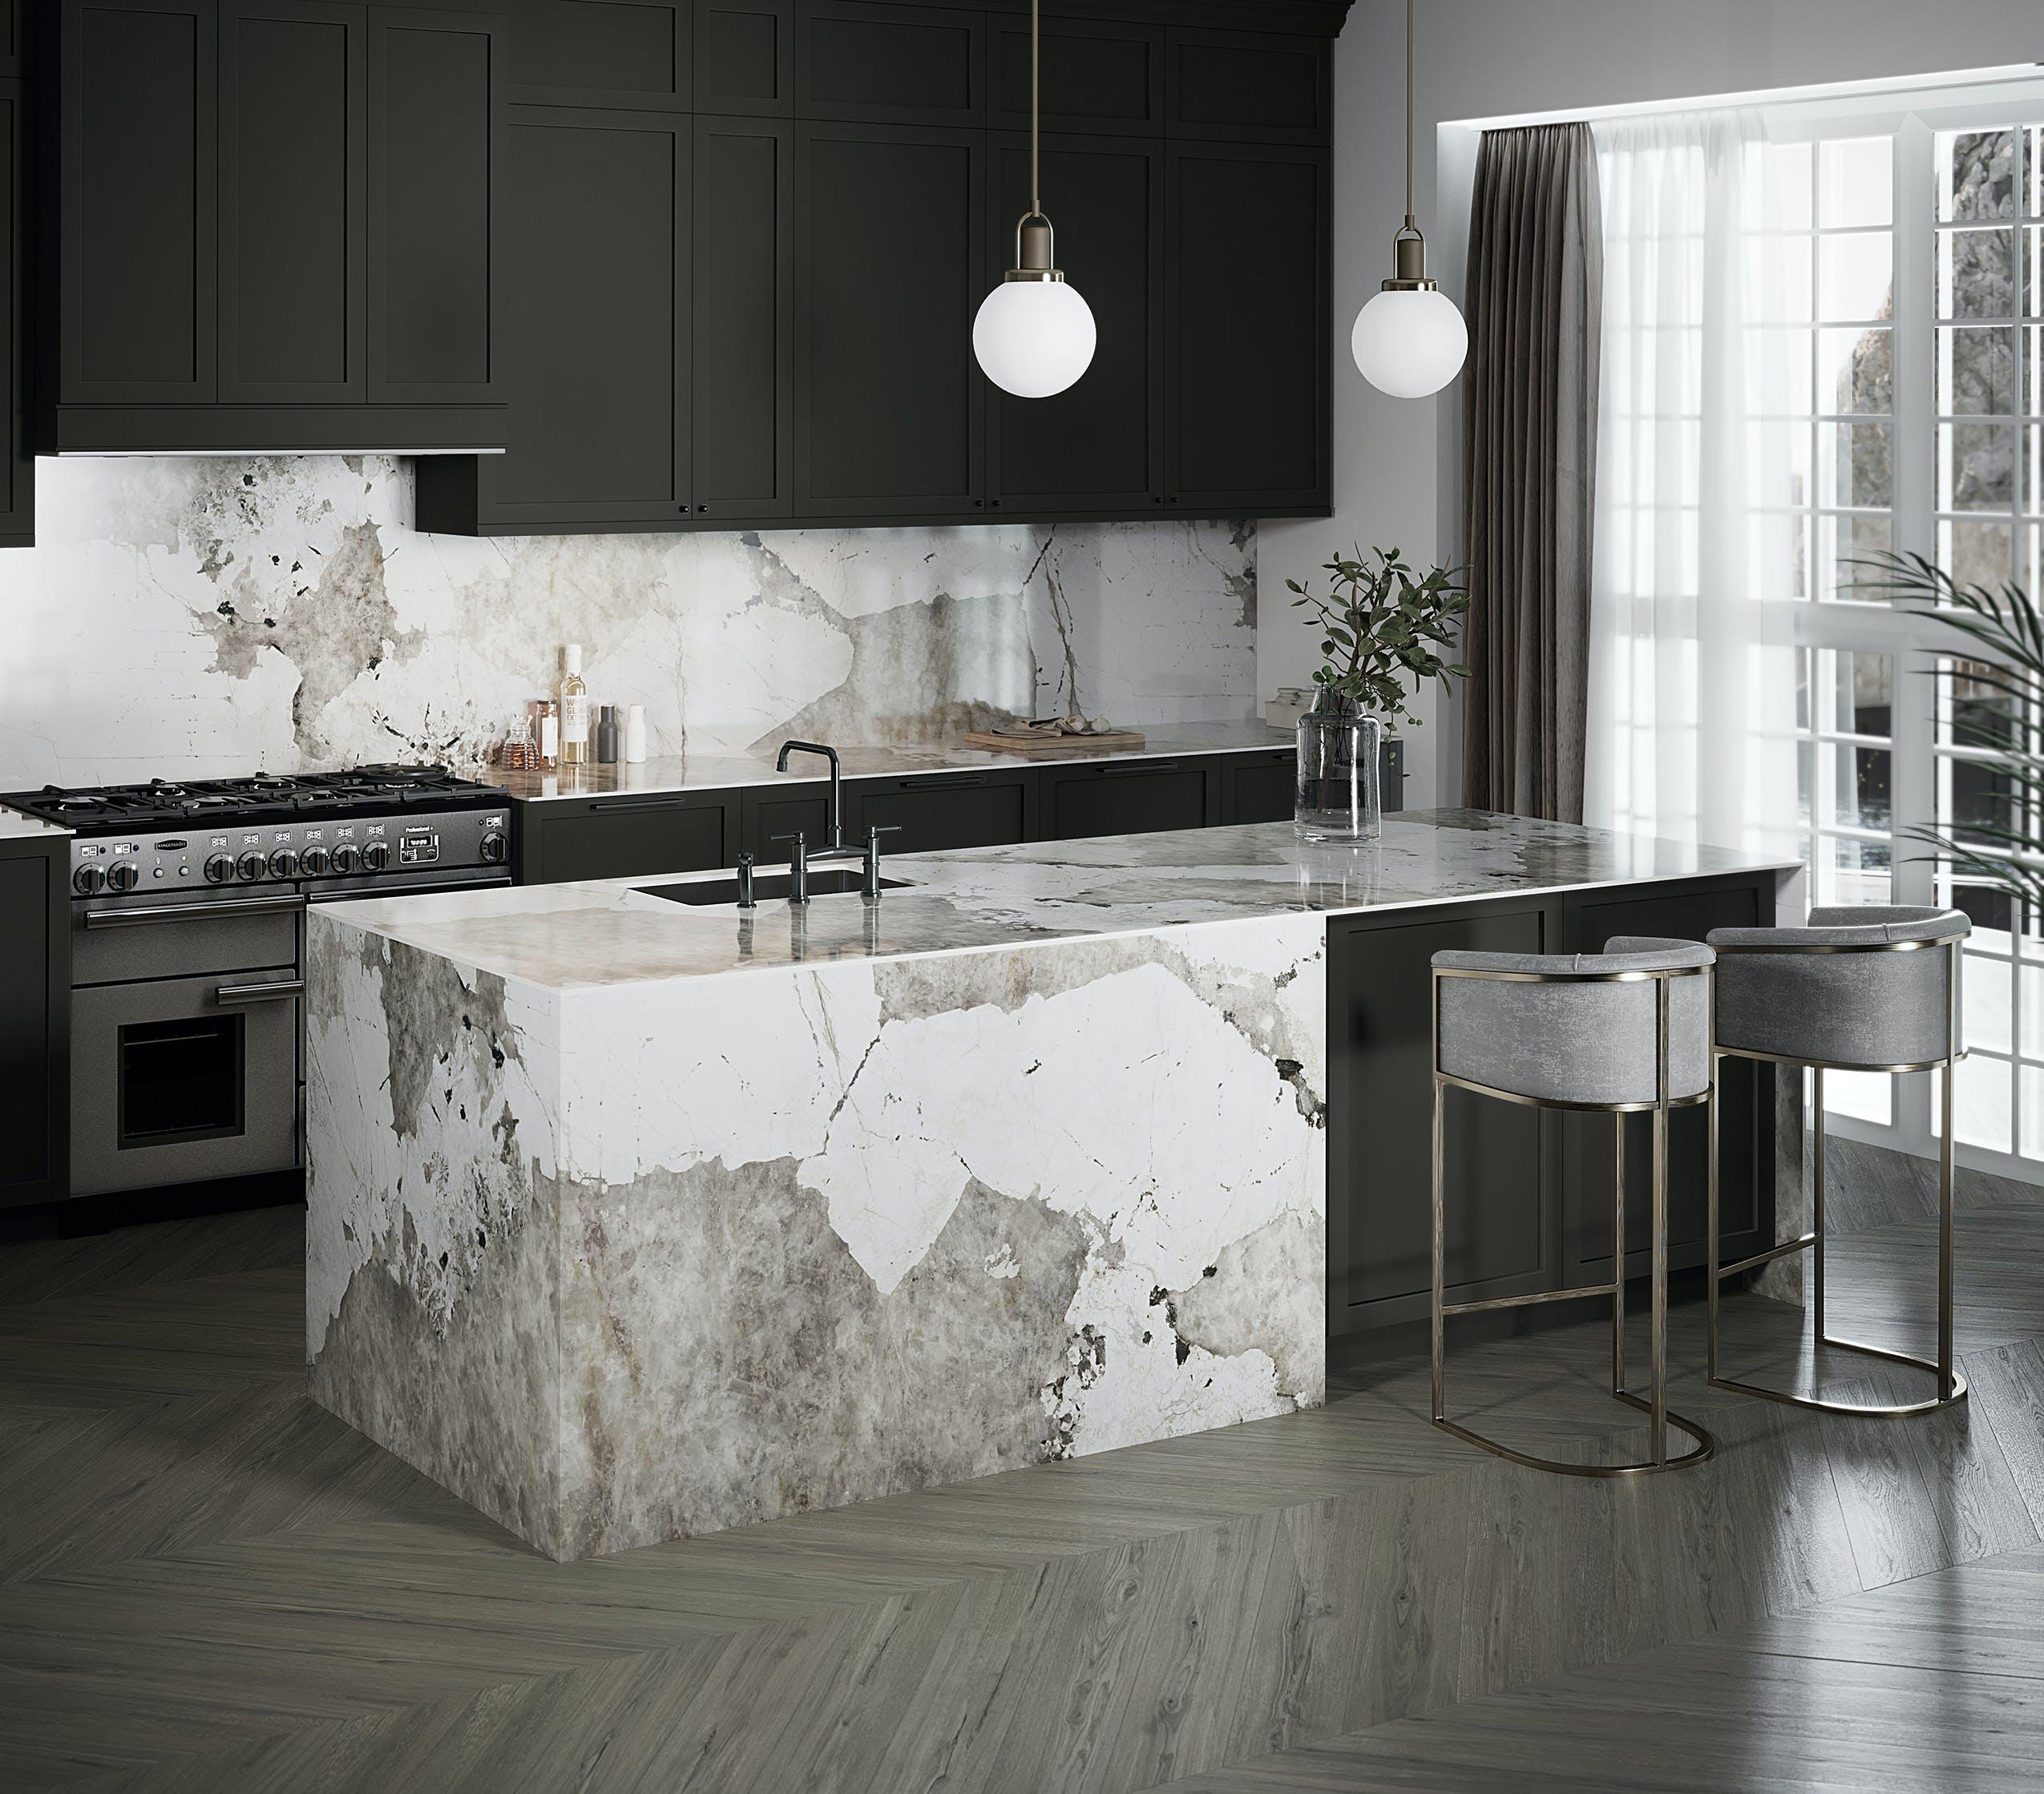 Image of Dekton Kitchen Khalo web 1 in Dekton Avant-Garde Series Named Honored in 2020 NYCxDesign Awards - Cosentino